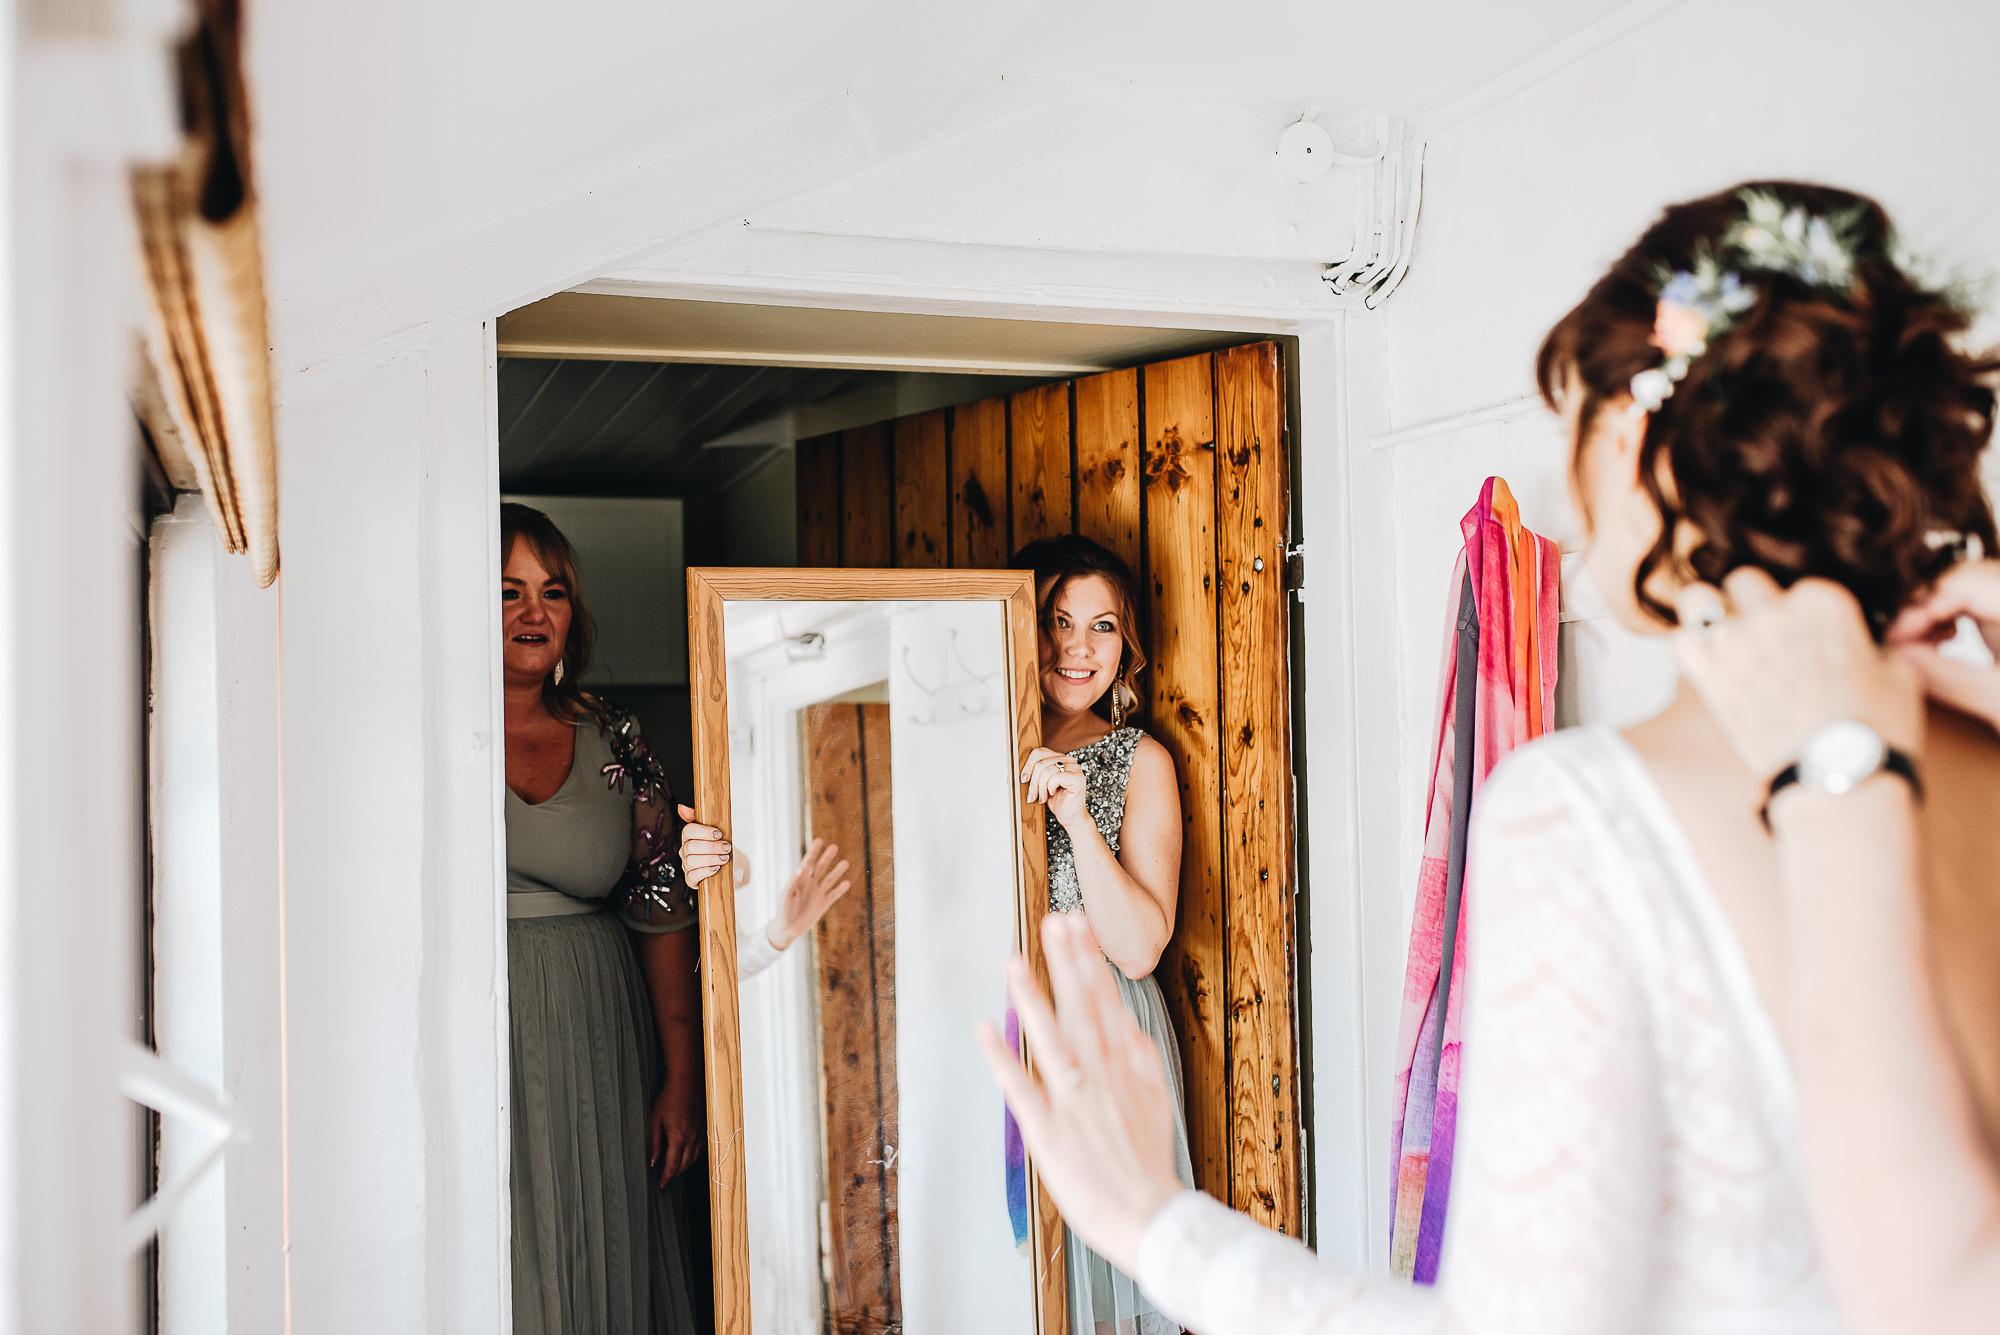 OurBeautifulAdventure-MaesbrookWedding-Lauren&Gareth-Blog-WebSize-5887.jpg